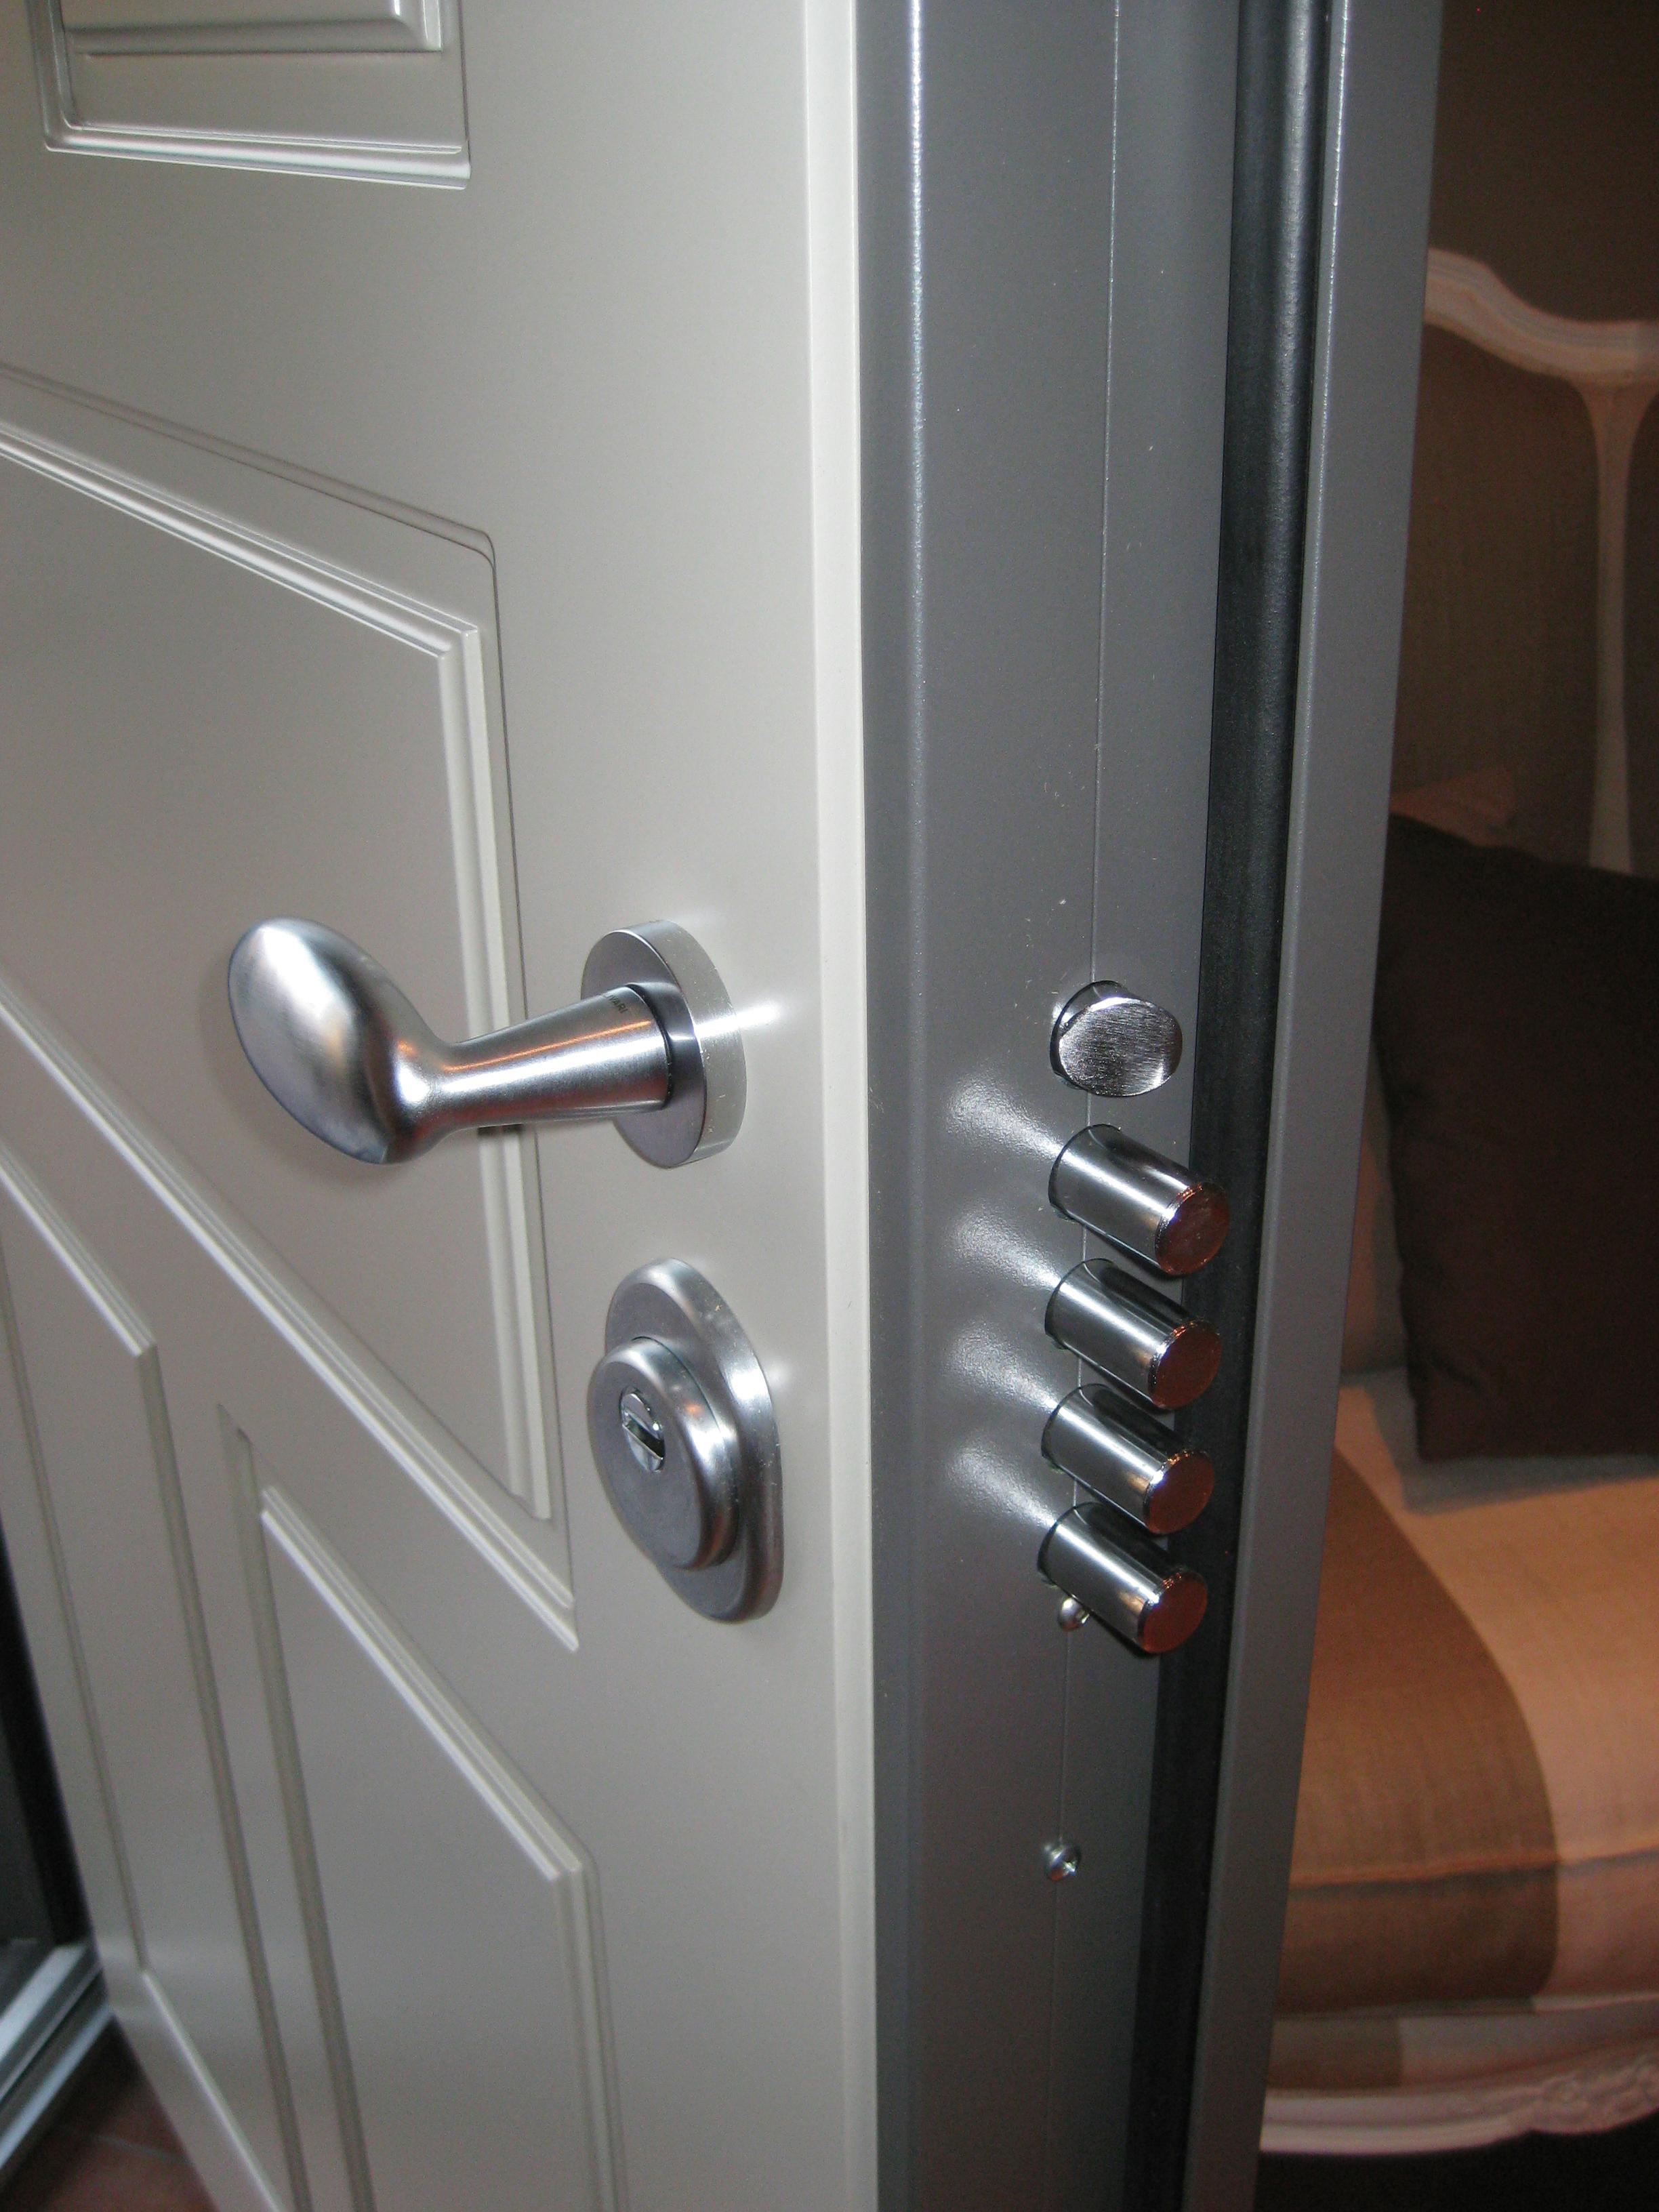 forcer une porte blind e il en faut des efforts. Black Bedroom Furniture Sets. Home Design Ideas